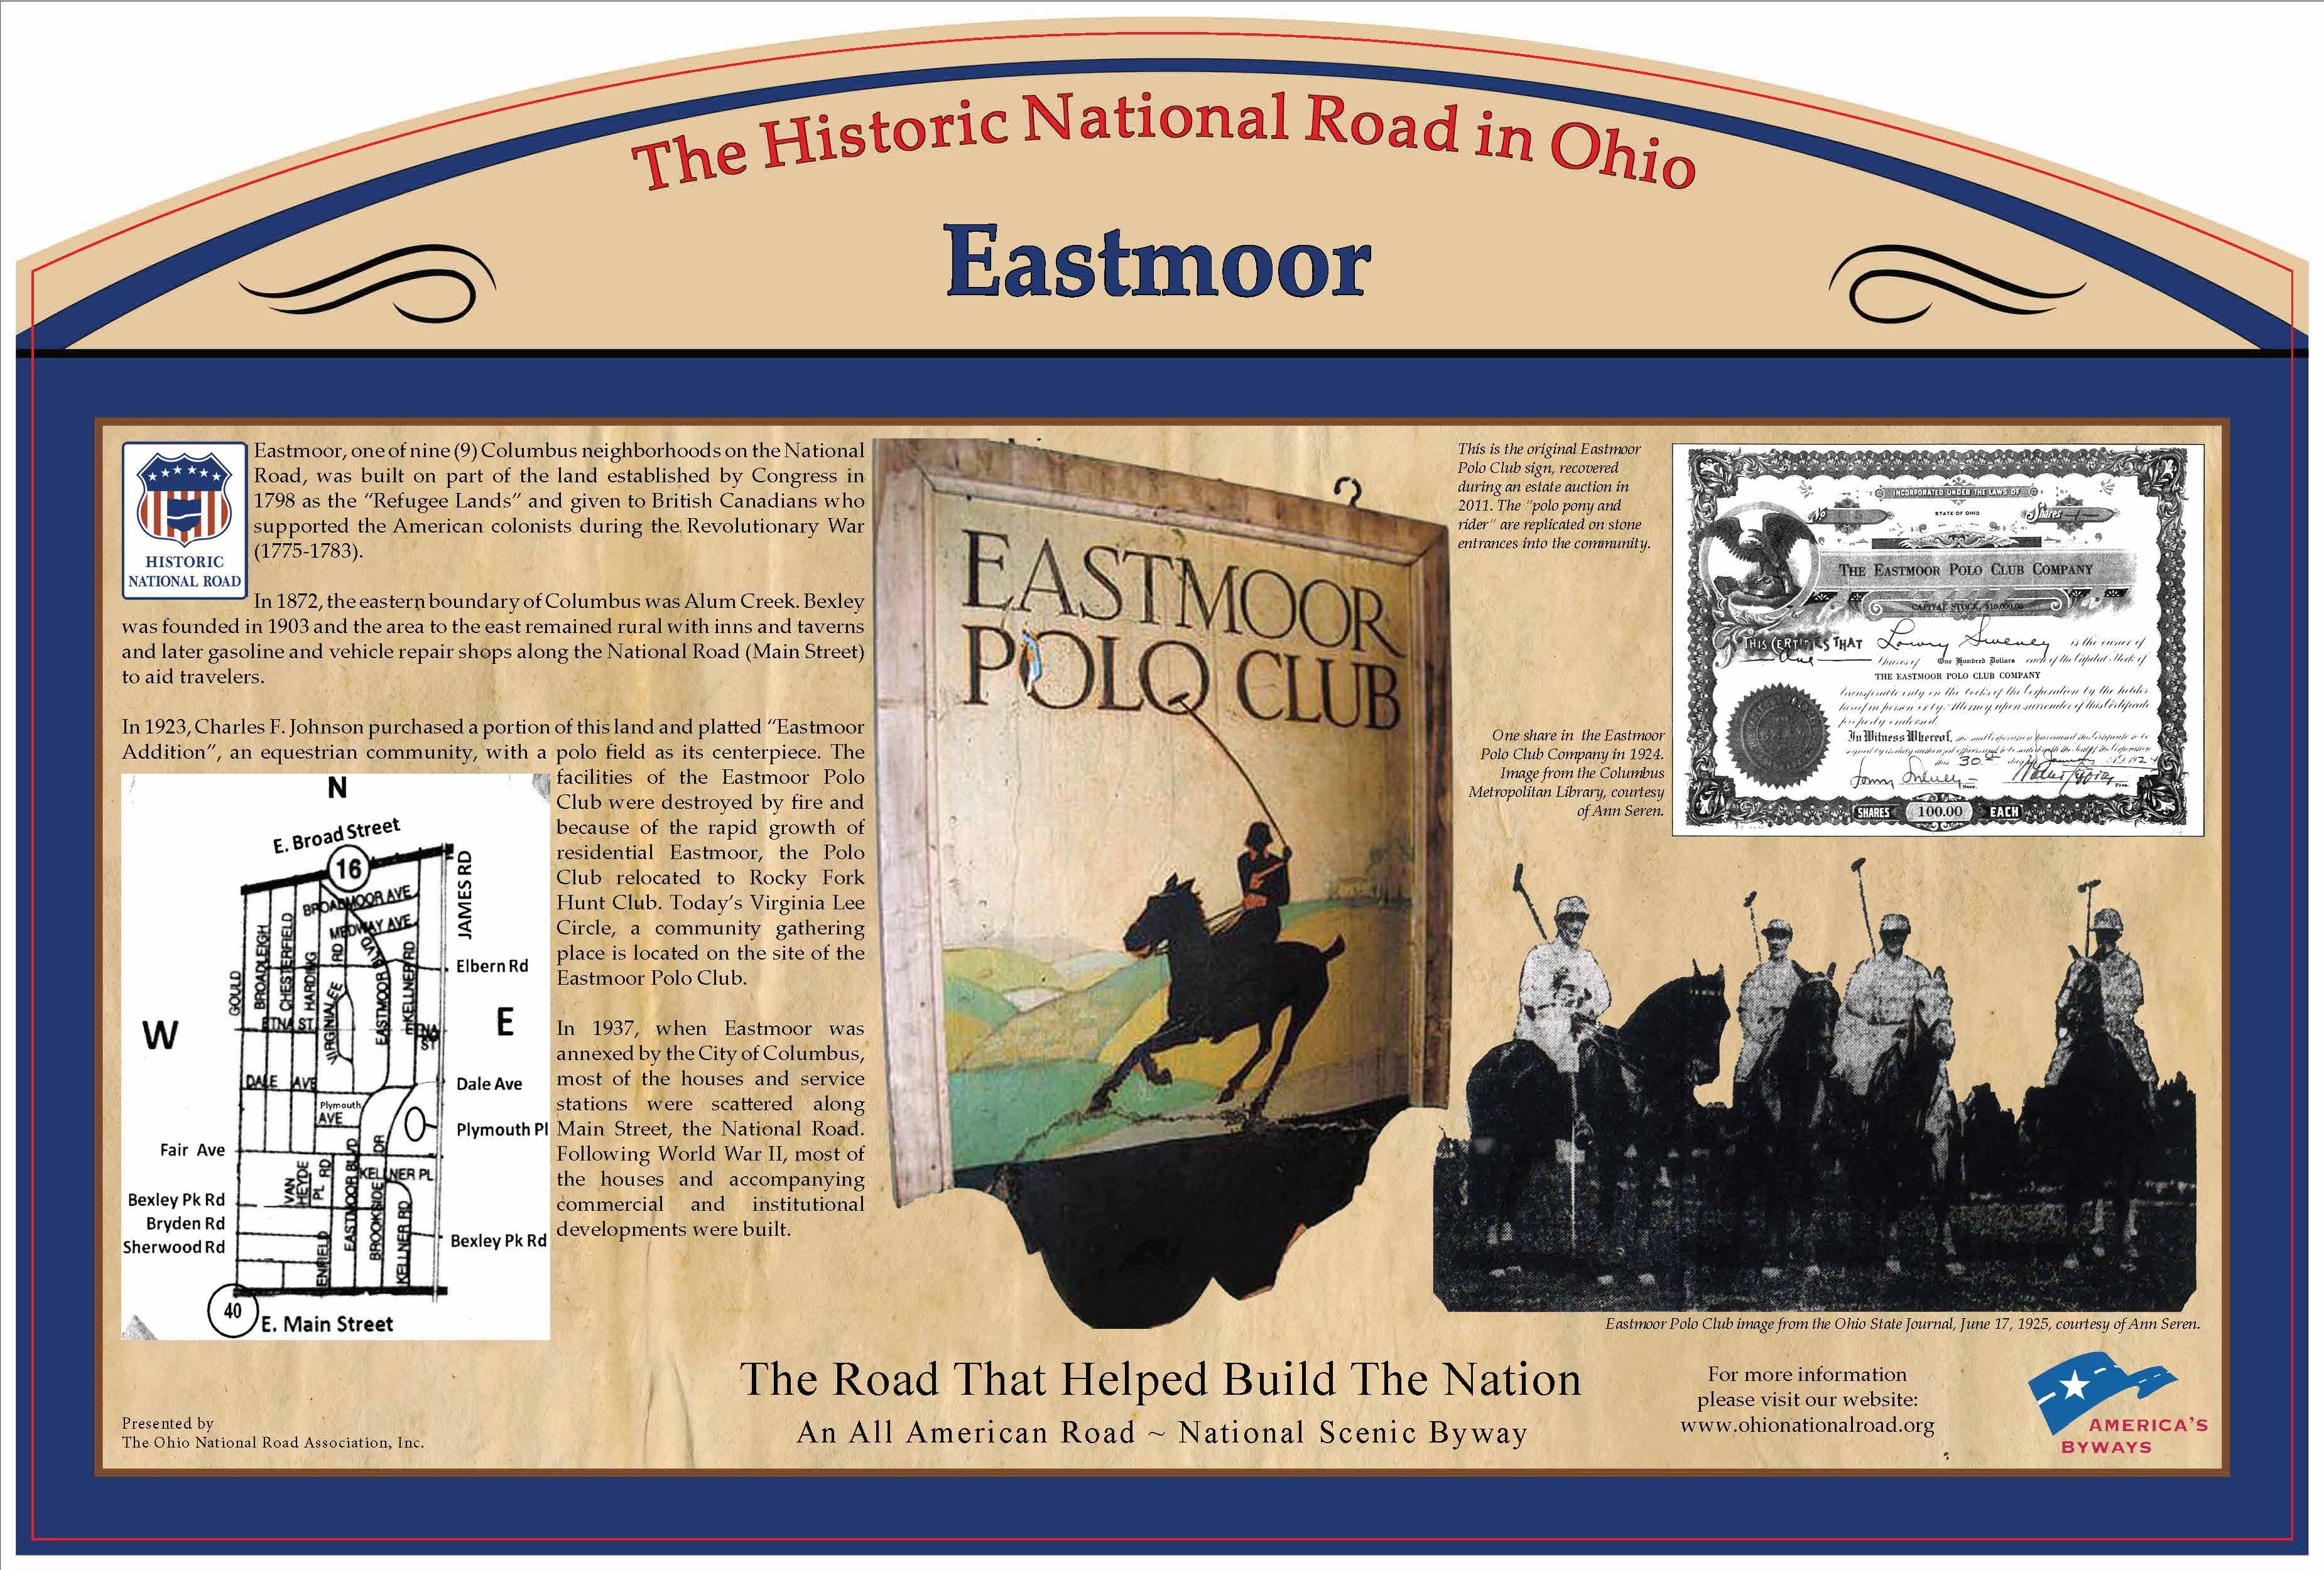 FINAL Eastmoor